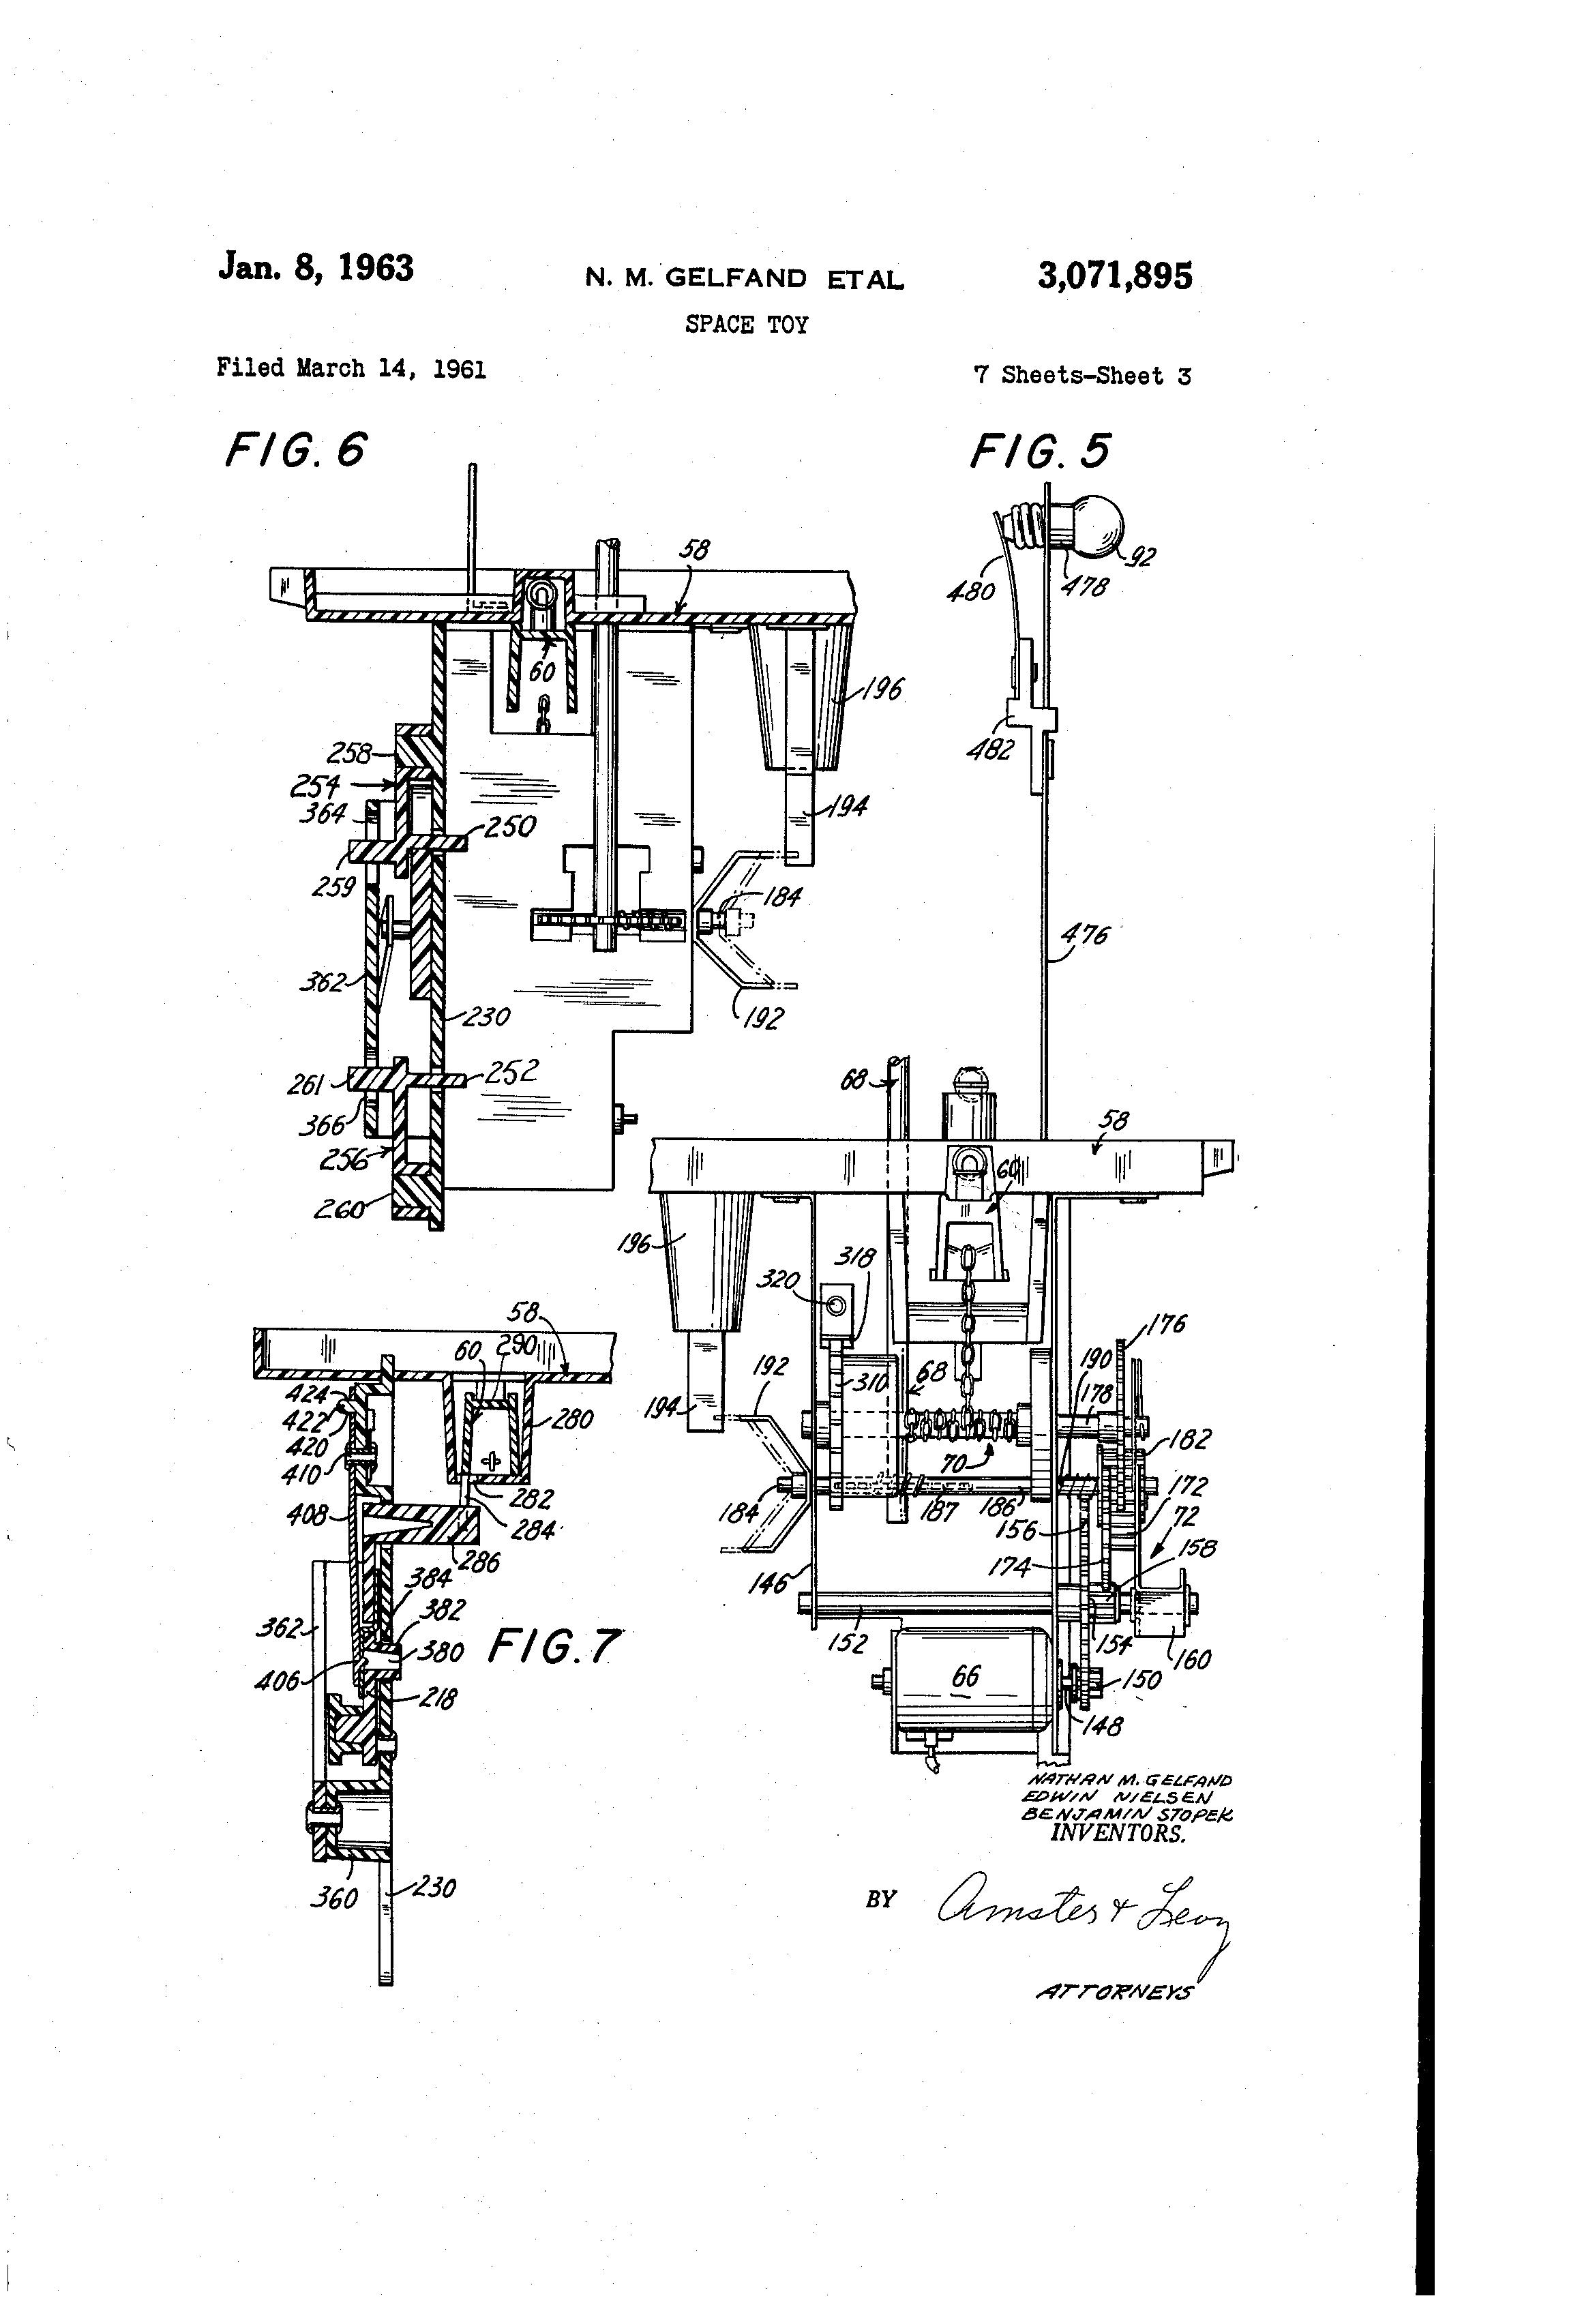 Lionel Wiring Schematics 6 28592 1955 Ford F250 Wiring Diagram – L2p1 Wiring Diagram For Harbor Breeze